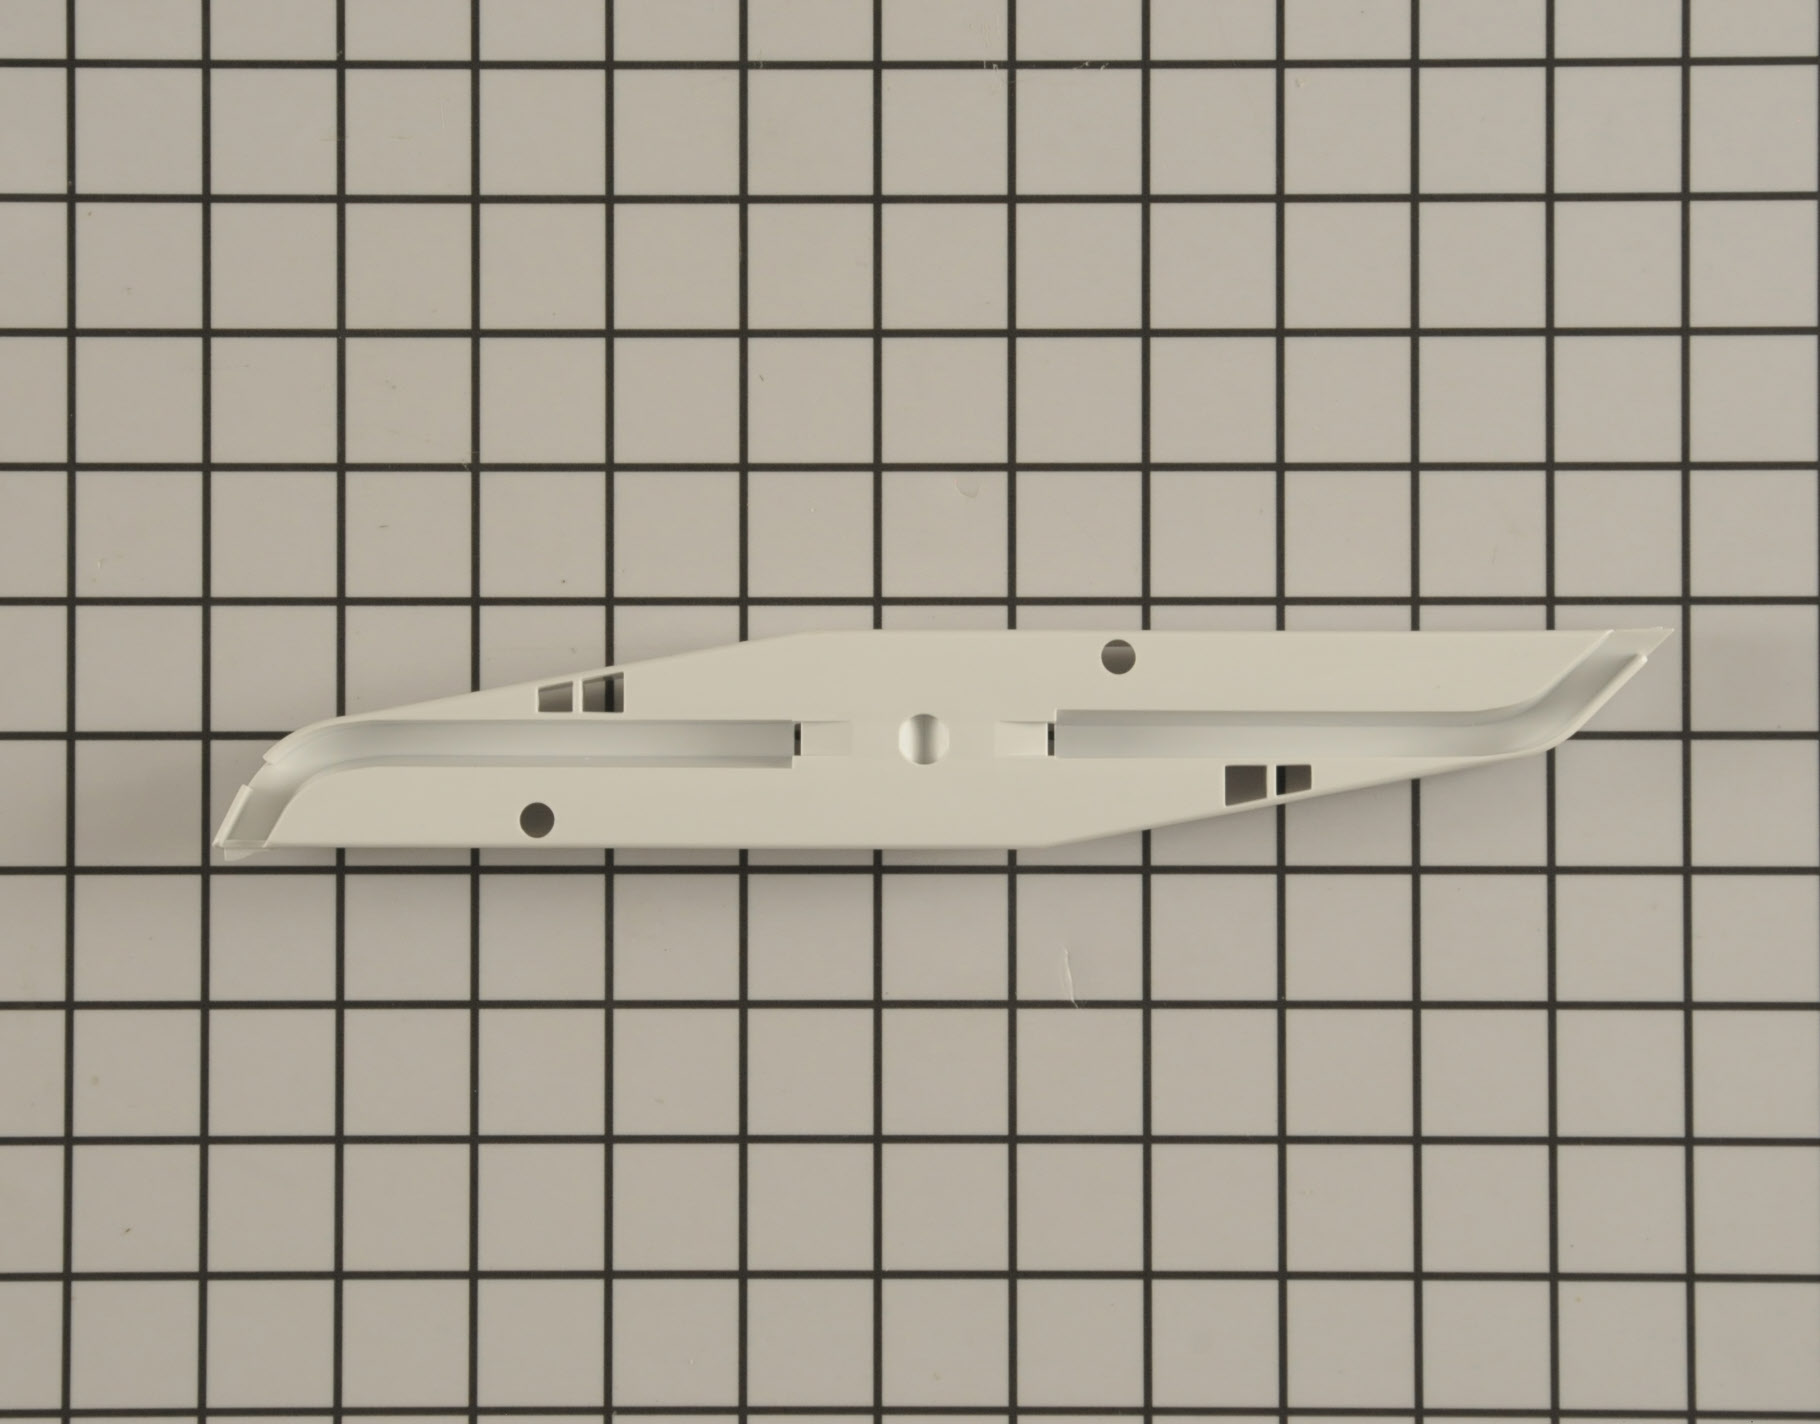 WP99001586 Crosley Dishwasher Part -Upper Wash Arm Spinner